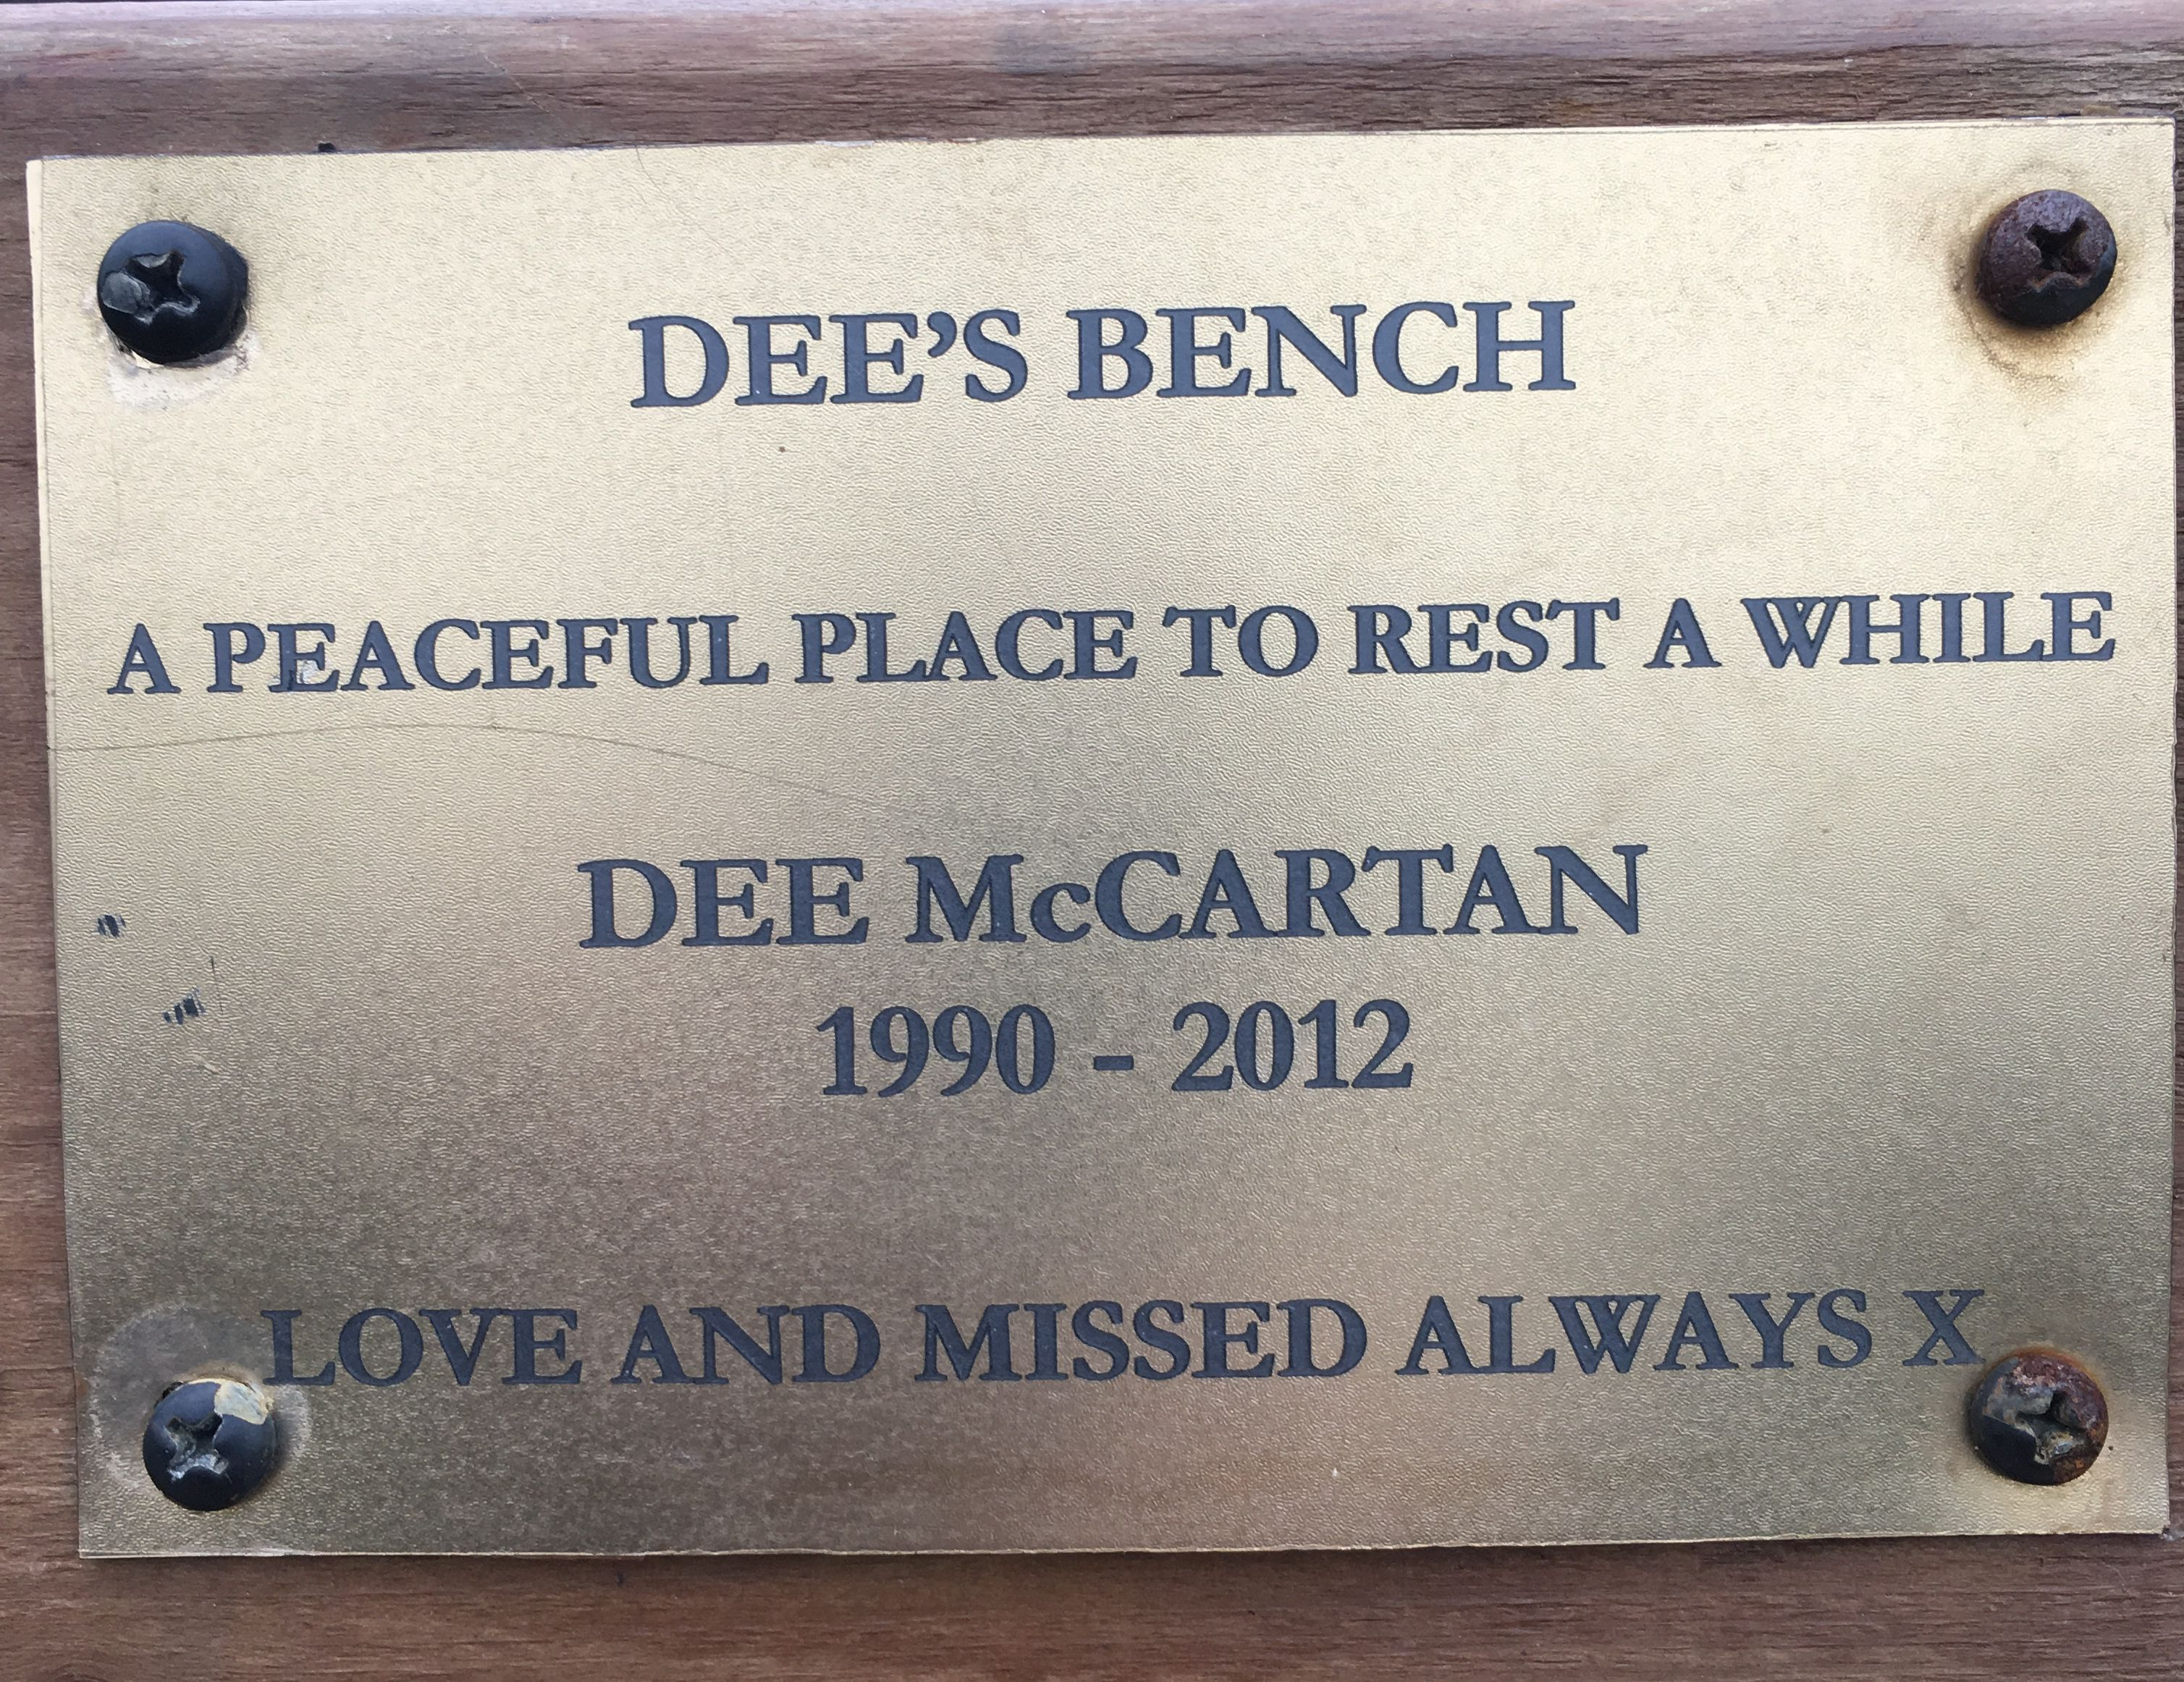 helen's bay memorial benches